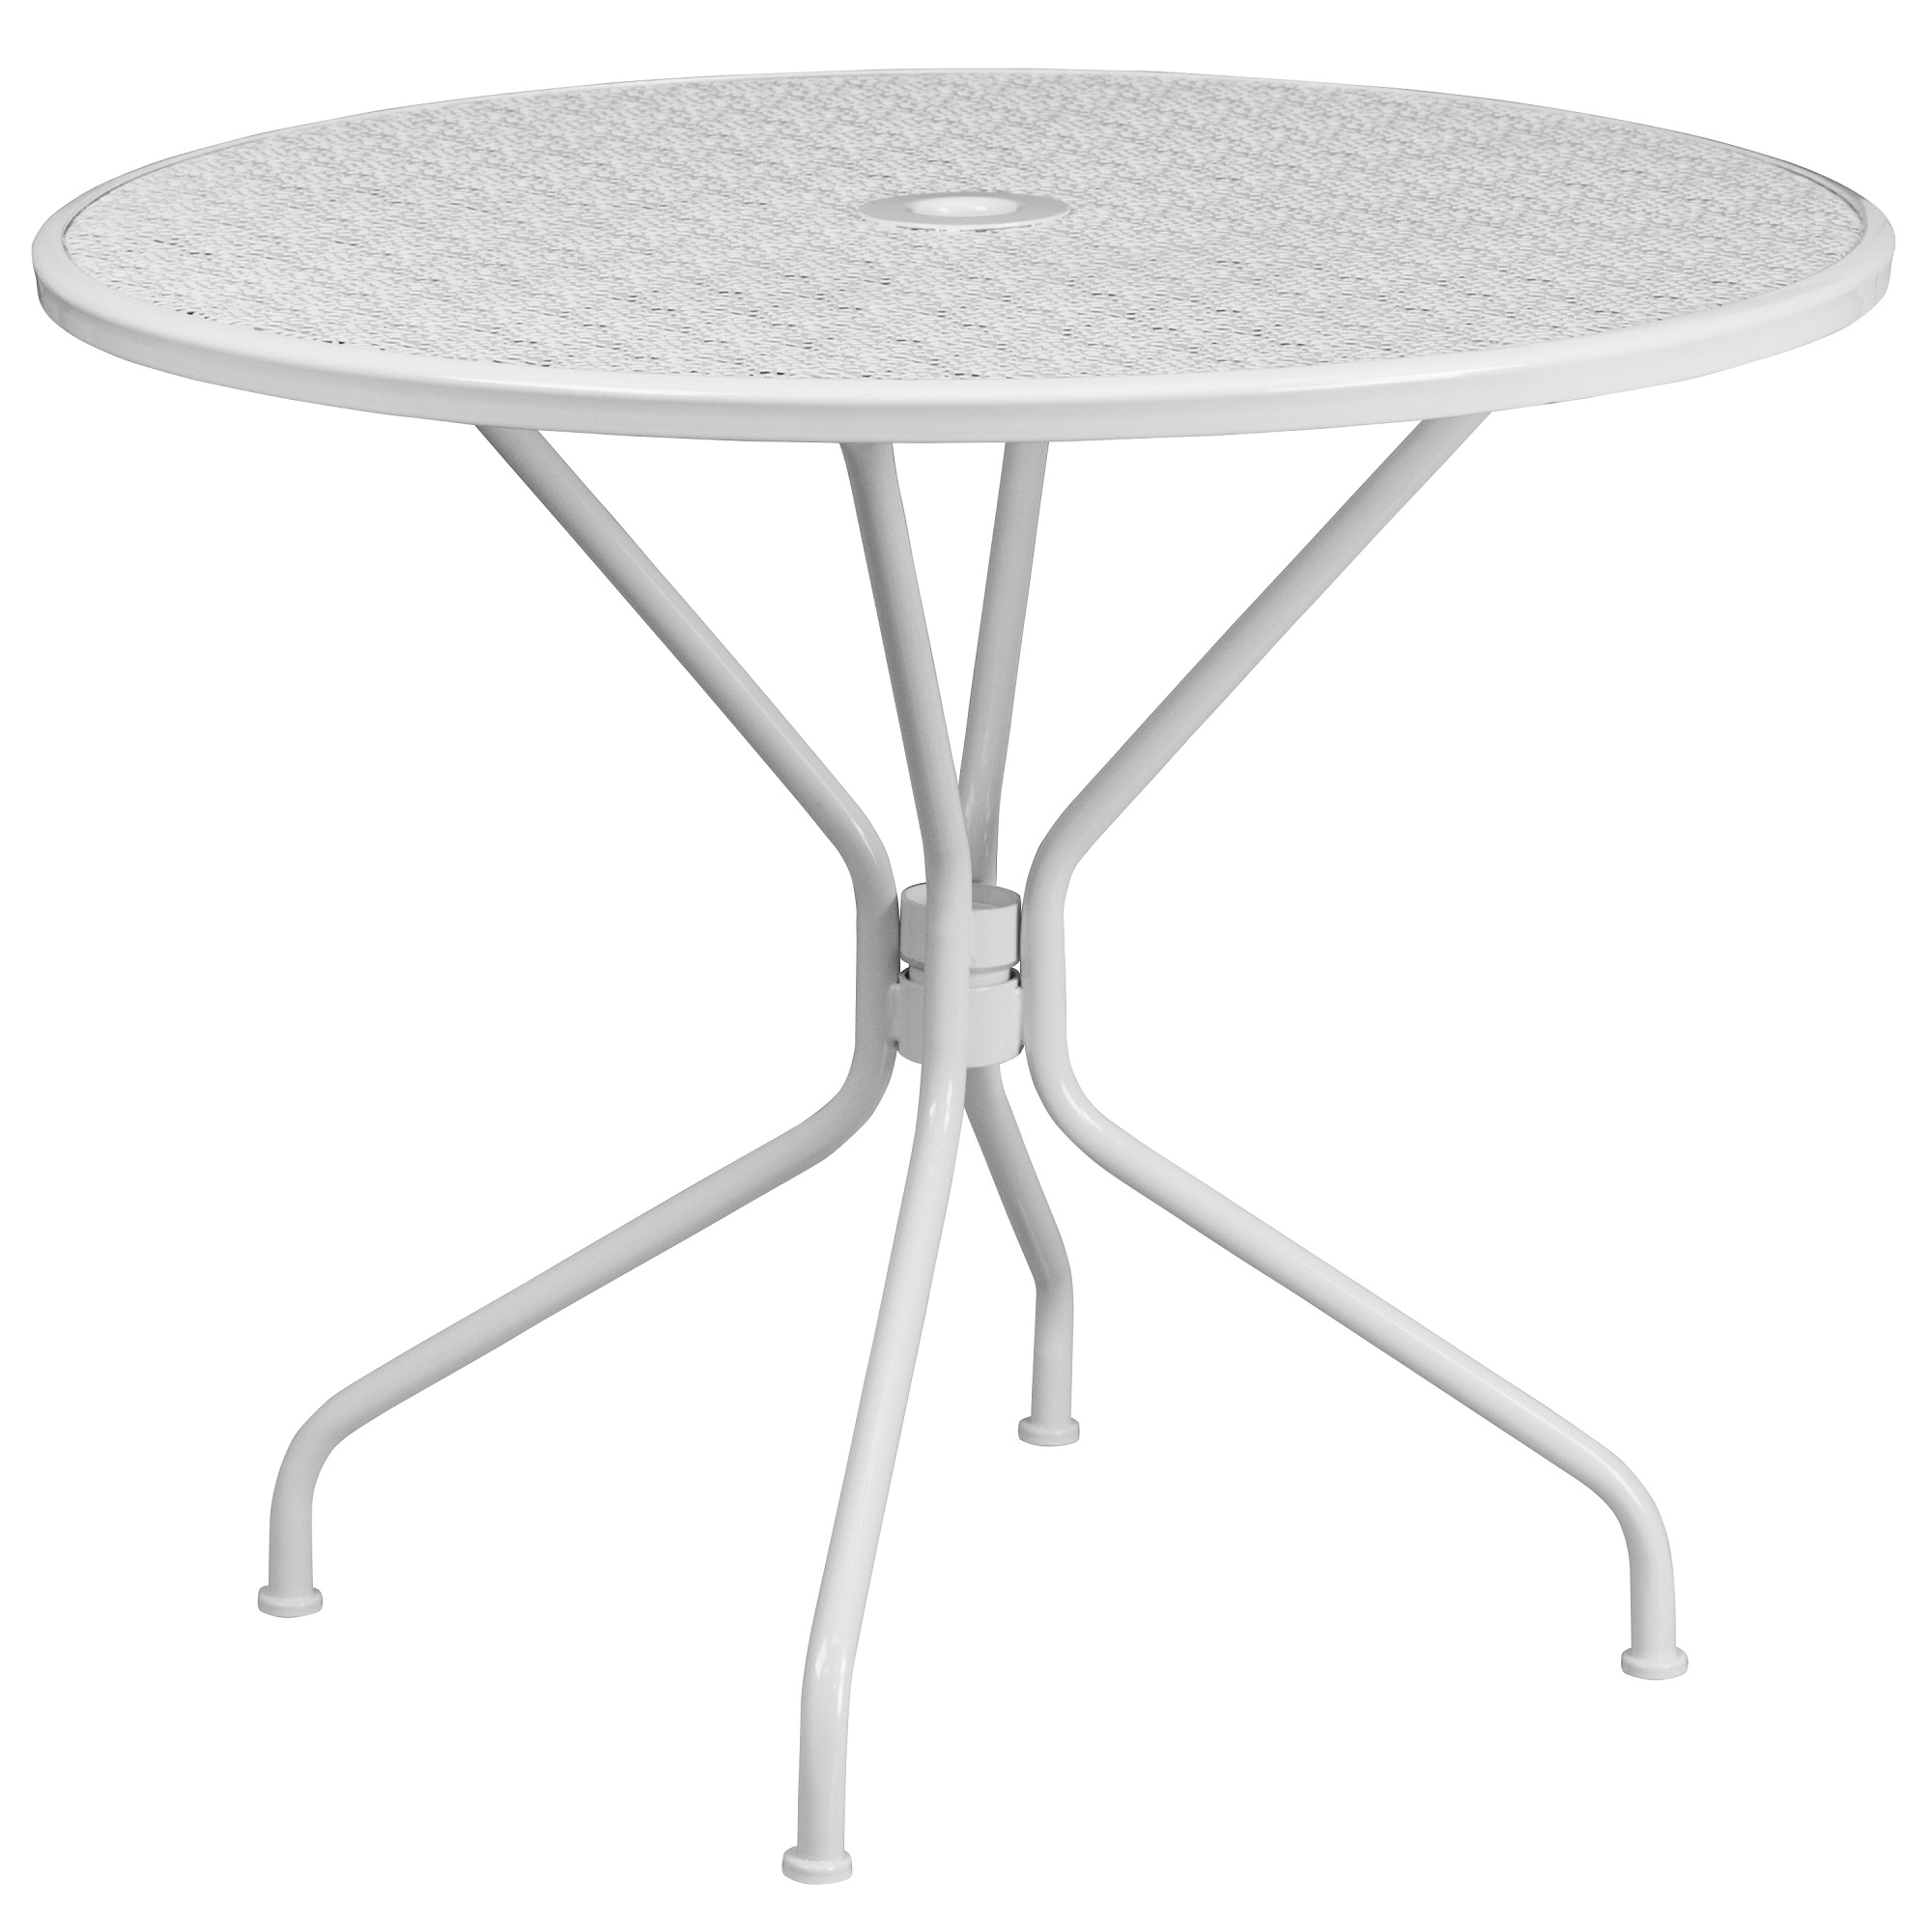 35 25 white contemporary round outdoor patio table with umbrella hole walmart com